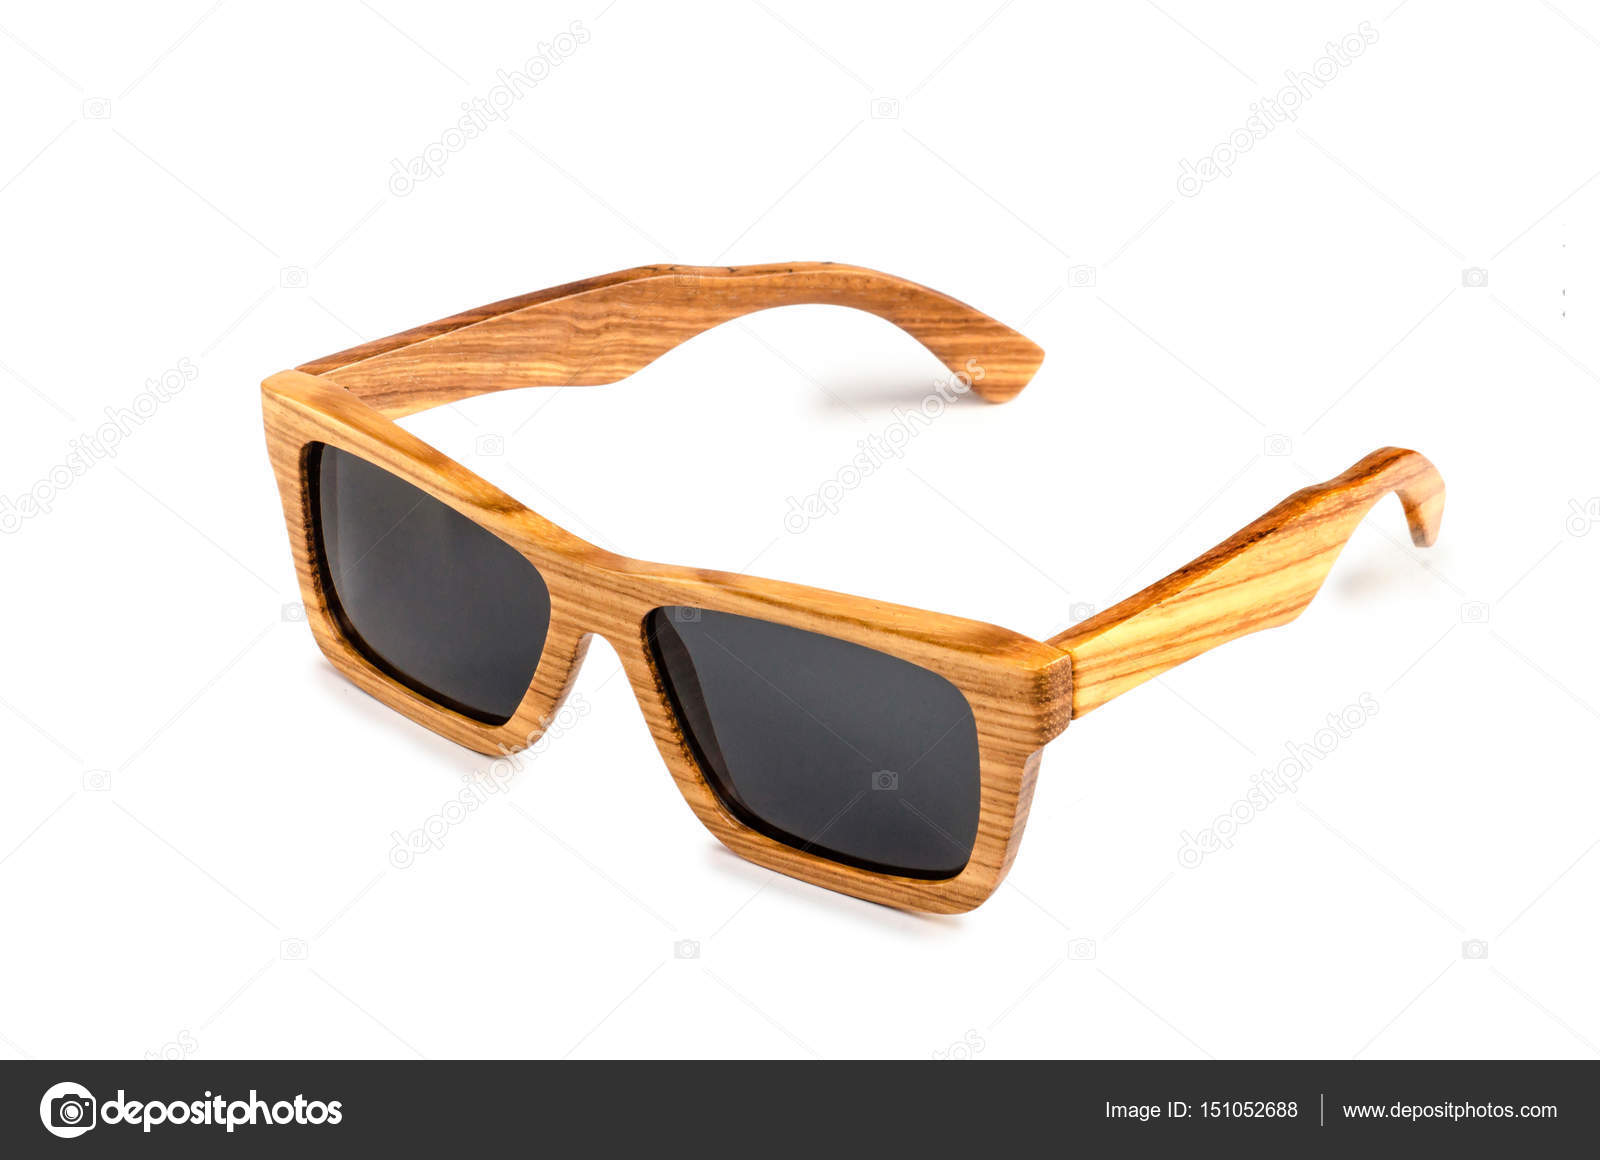 a65ce8850cc37 Óculos de sol de bambu — Stock Photo © Dudaeva  151052688